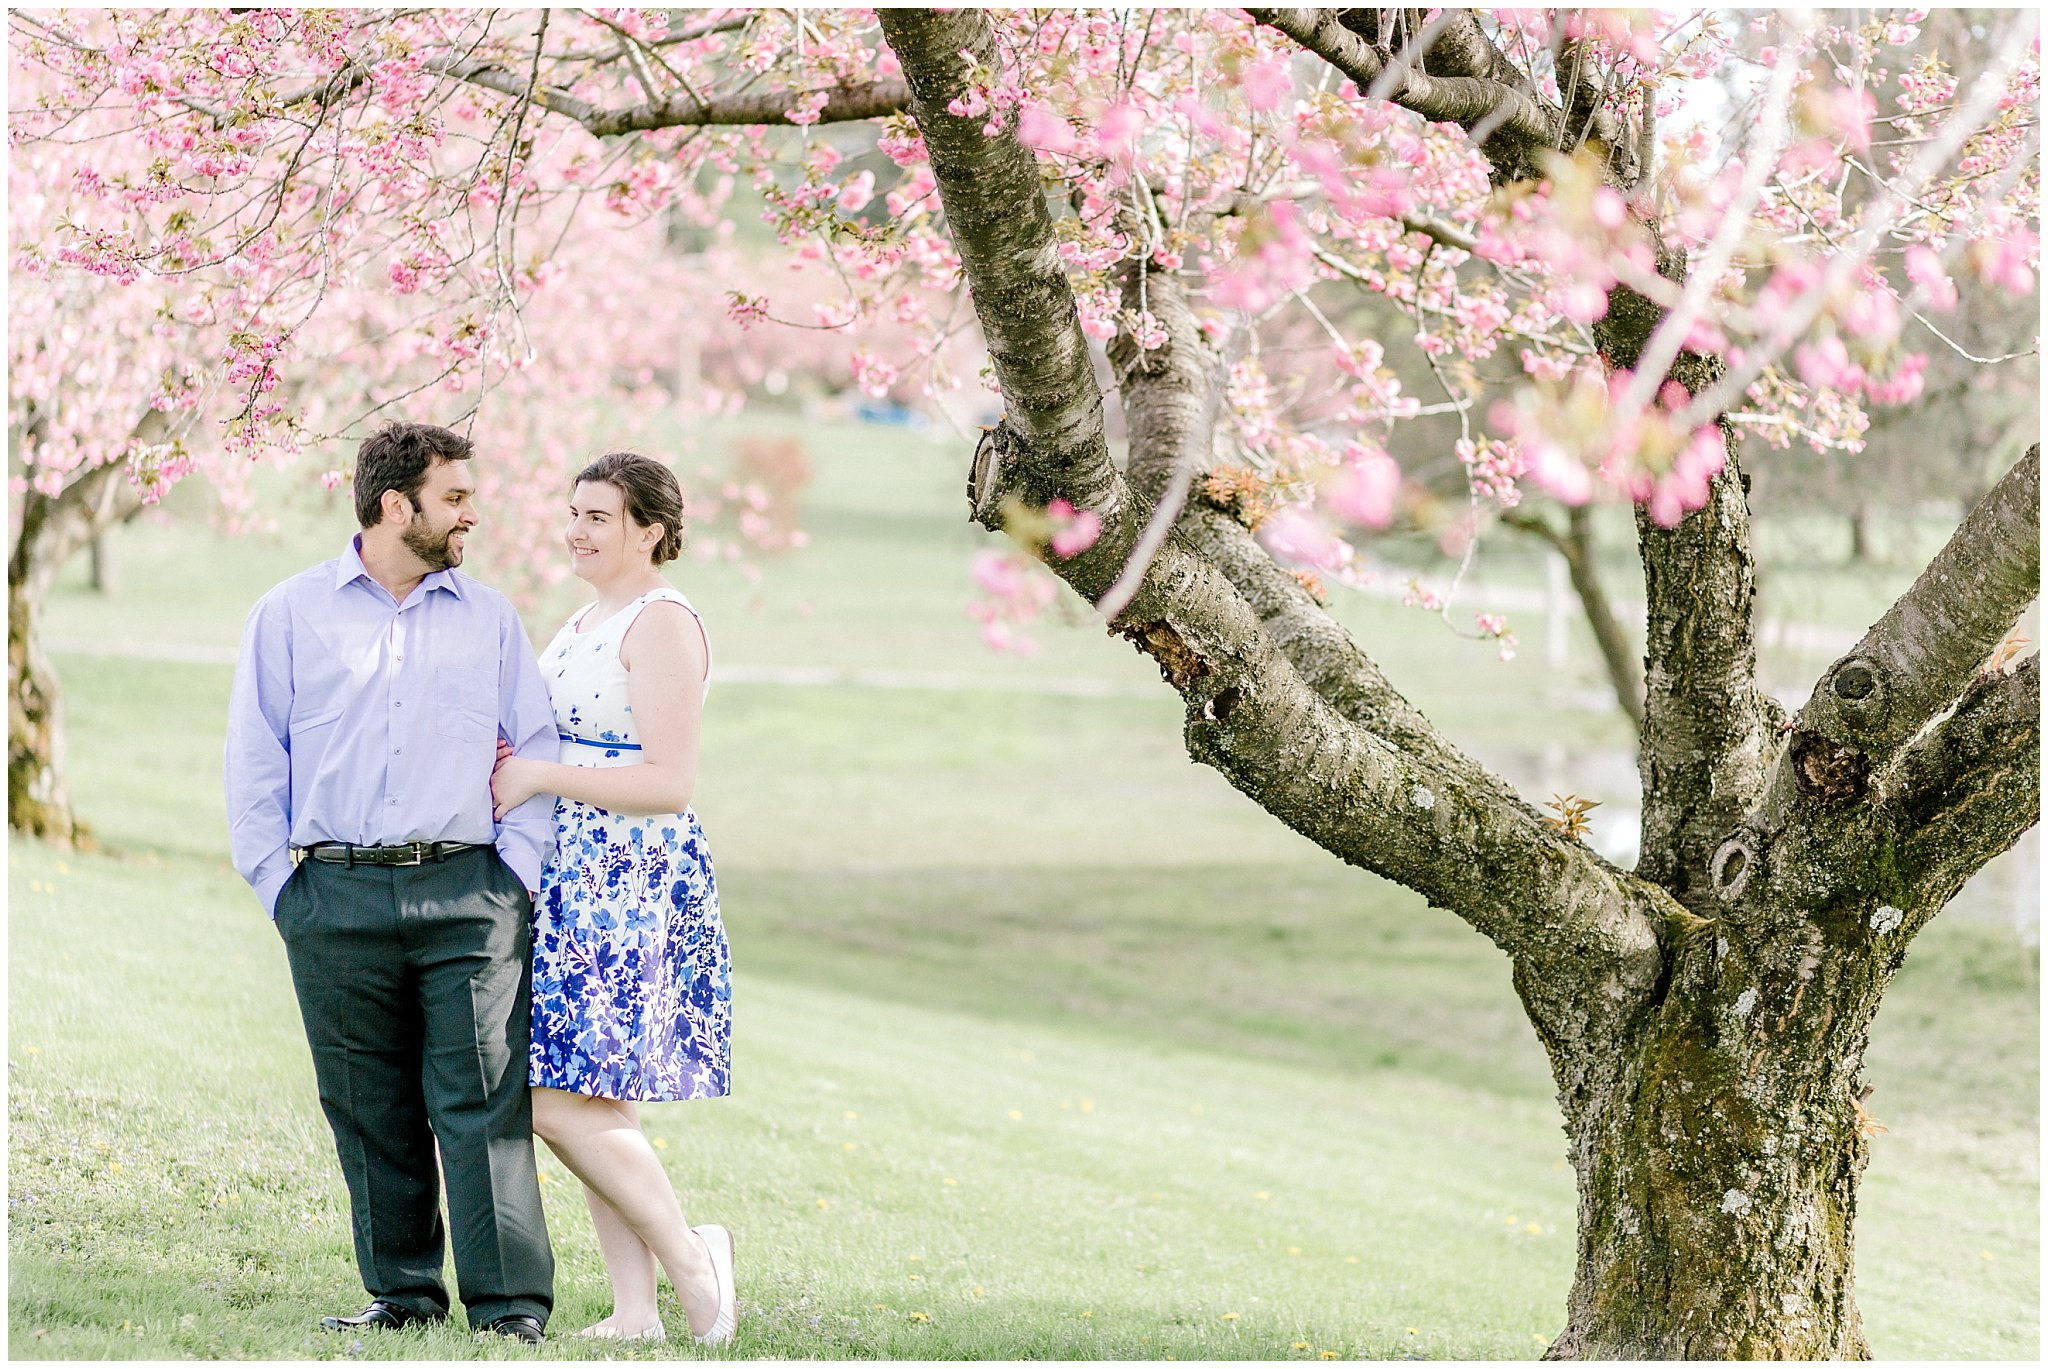 Lehigh Valley Spring Cherry Blossom Engagement Session Pennsylvania Wedding Photographer (12).jpg